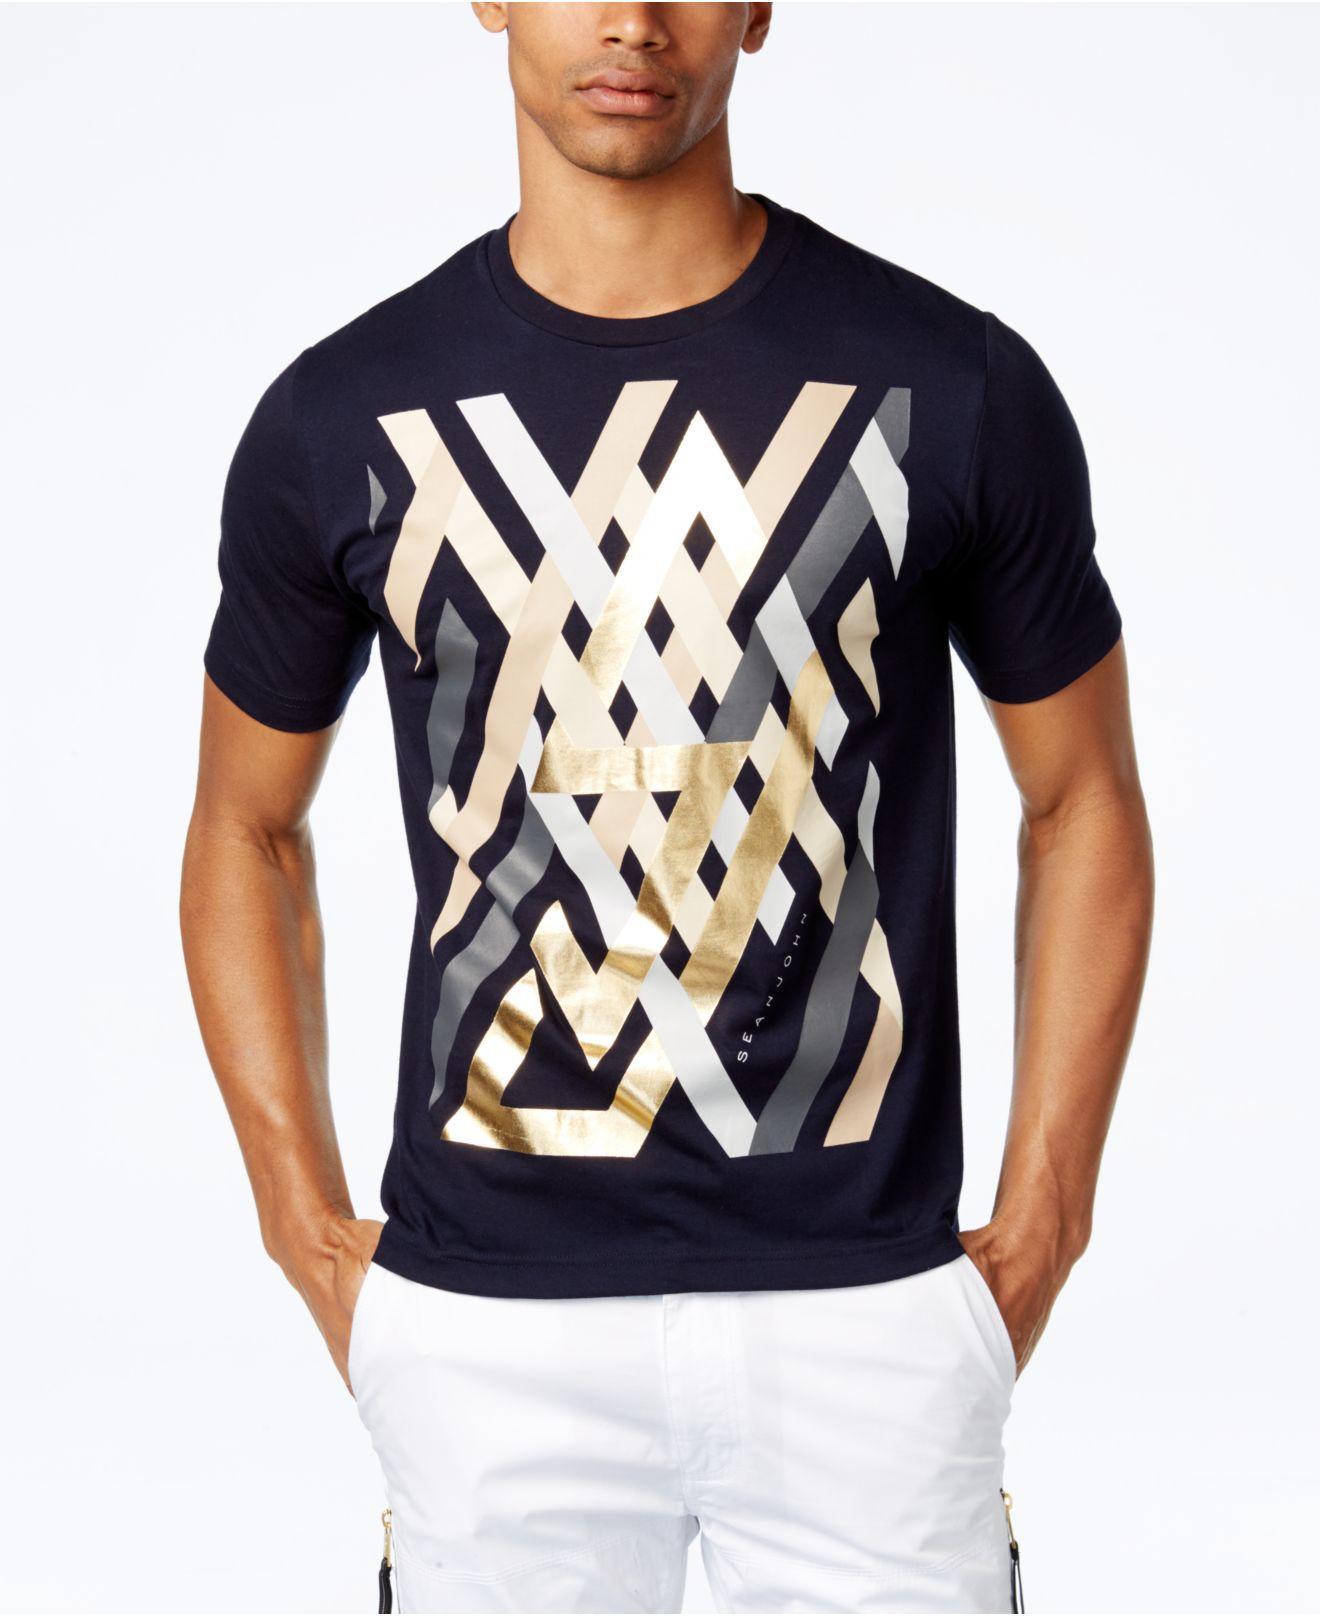 Lyst sean john men 39 s graphic print cotton t shirt in for Sean john t shirts for mens